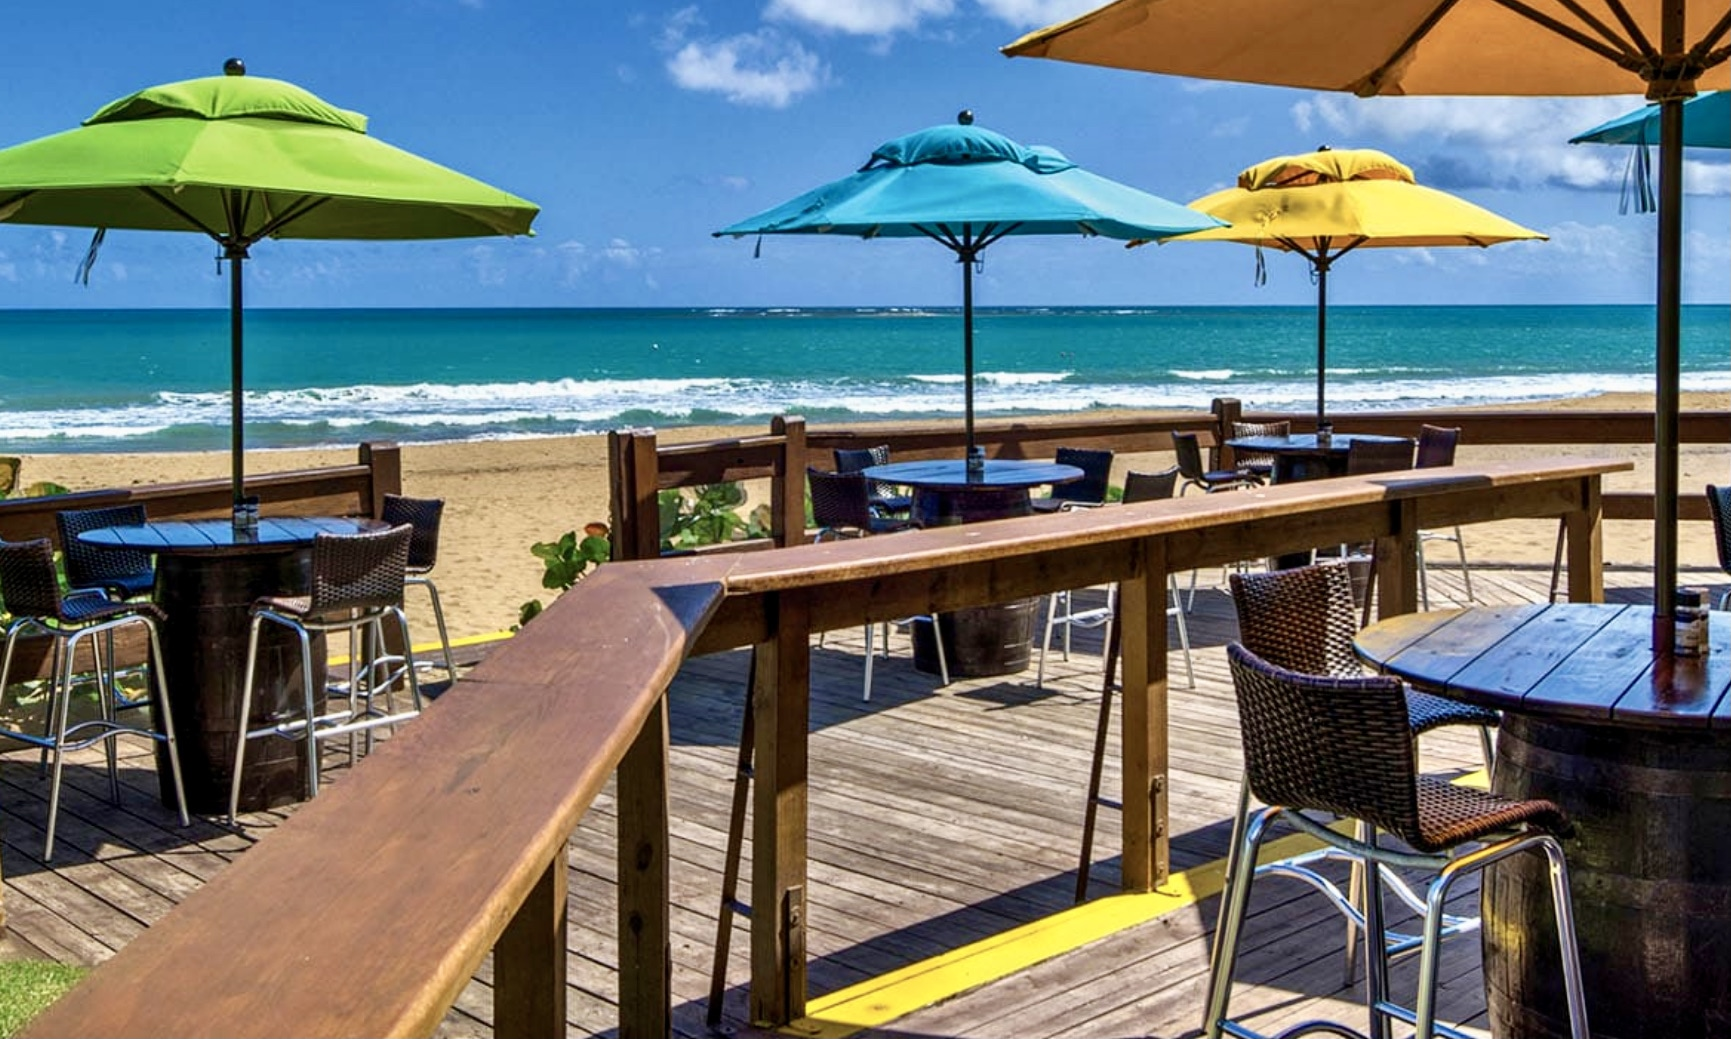 Margaritaville Vacation Club - Puerto Rico